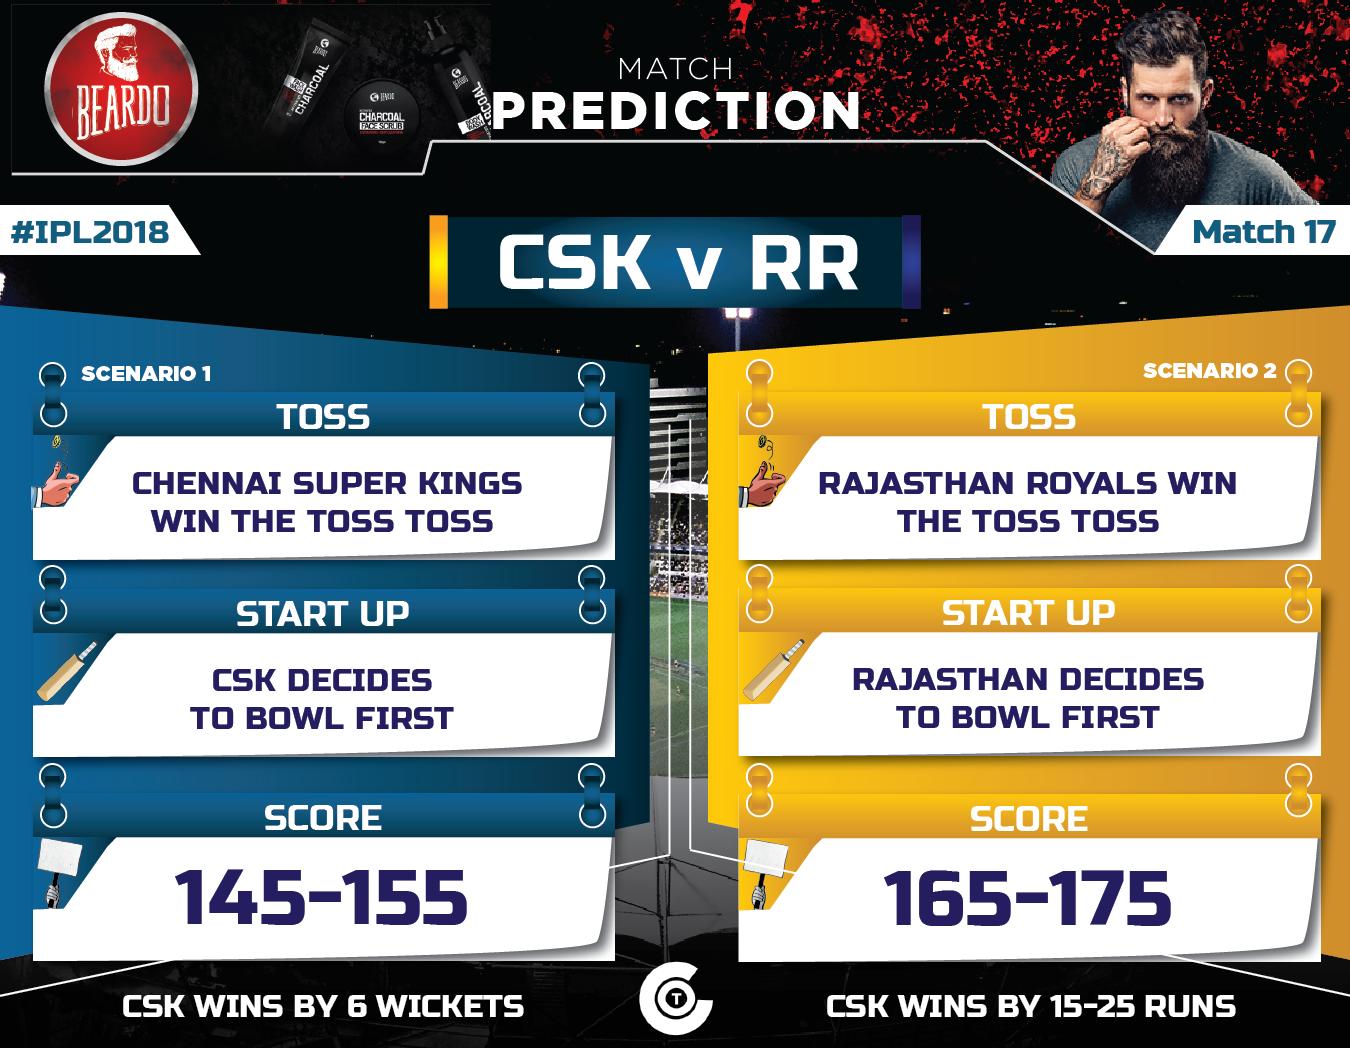 IPL-2018-Todays-match-prediction-CSK-vs-RR-Match-17-Prediction-Chennai-Super-Kings-vs-Rajasthan-Royals